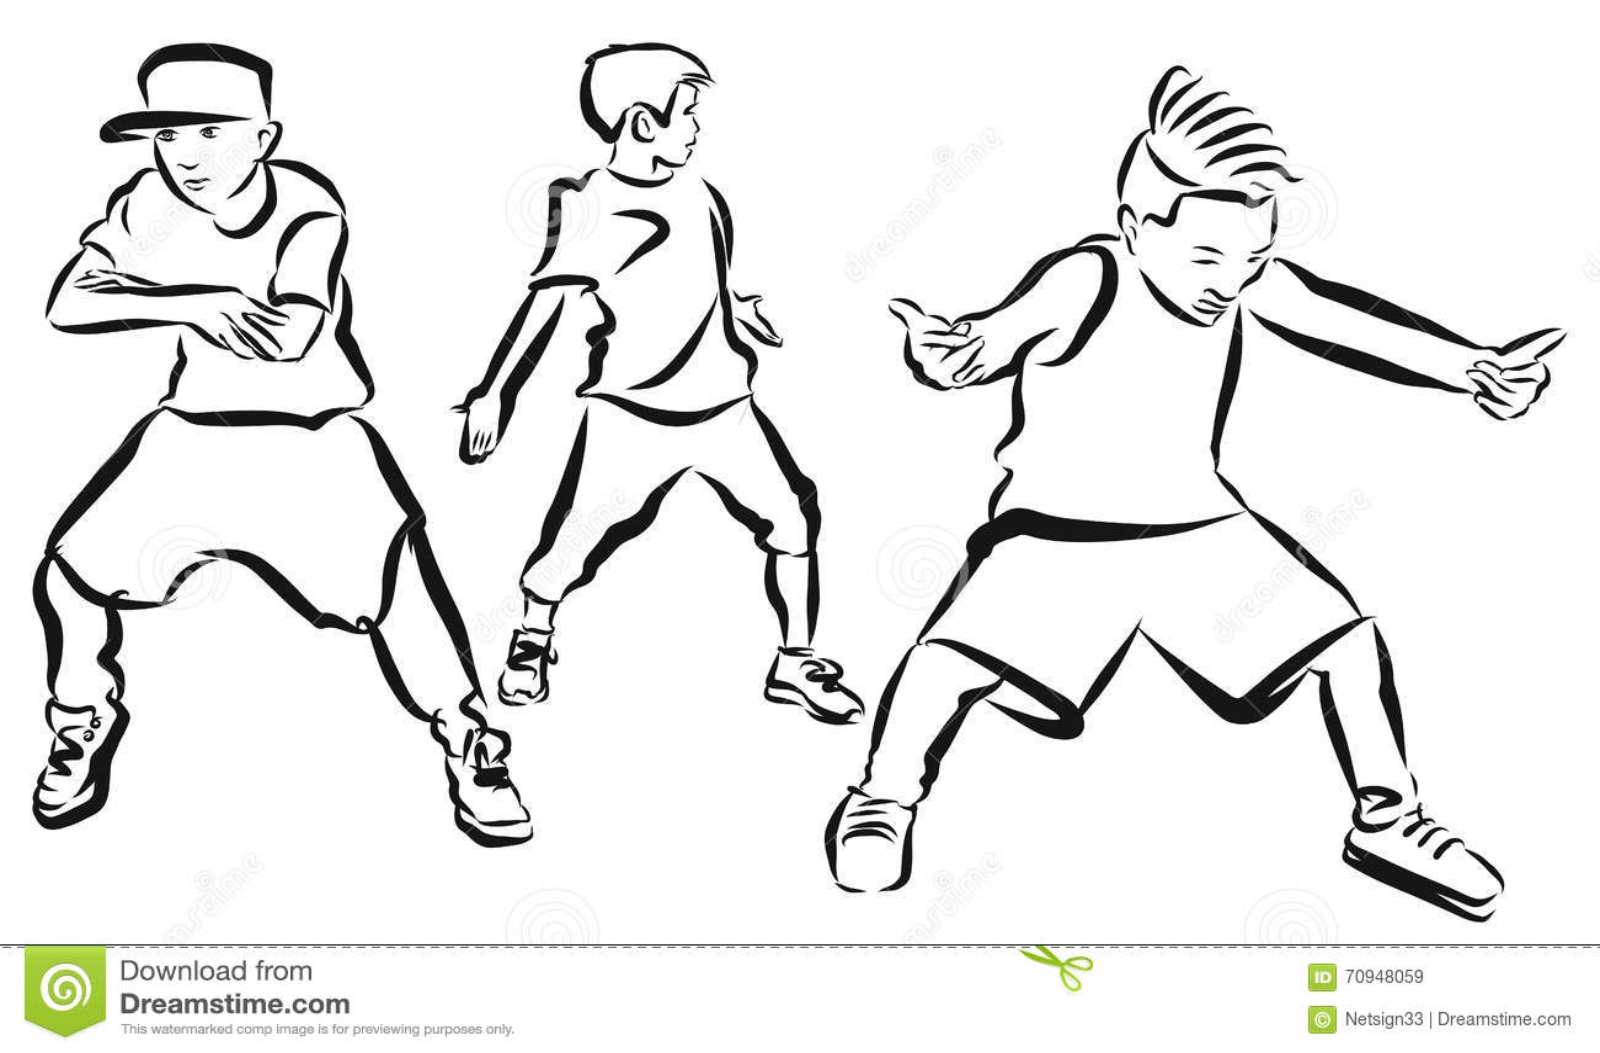 three boys coloring page hip hop choreography stock vector